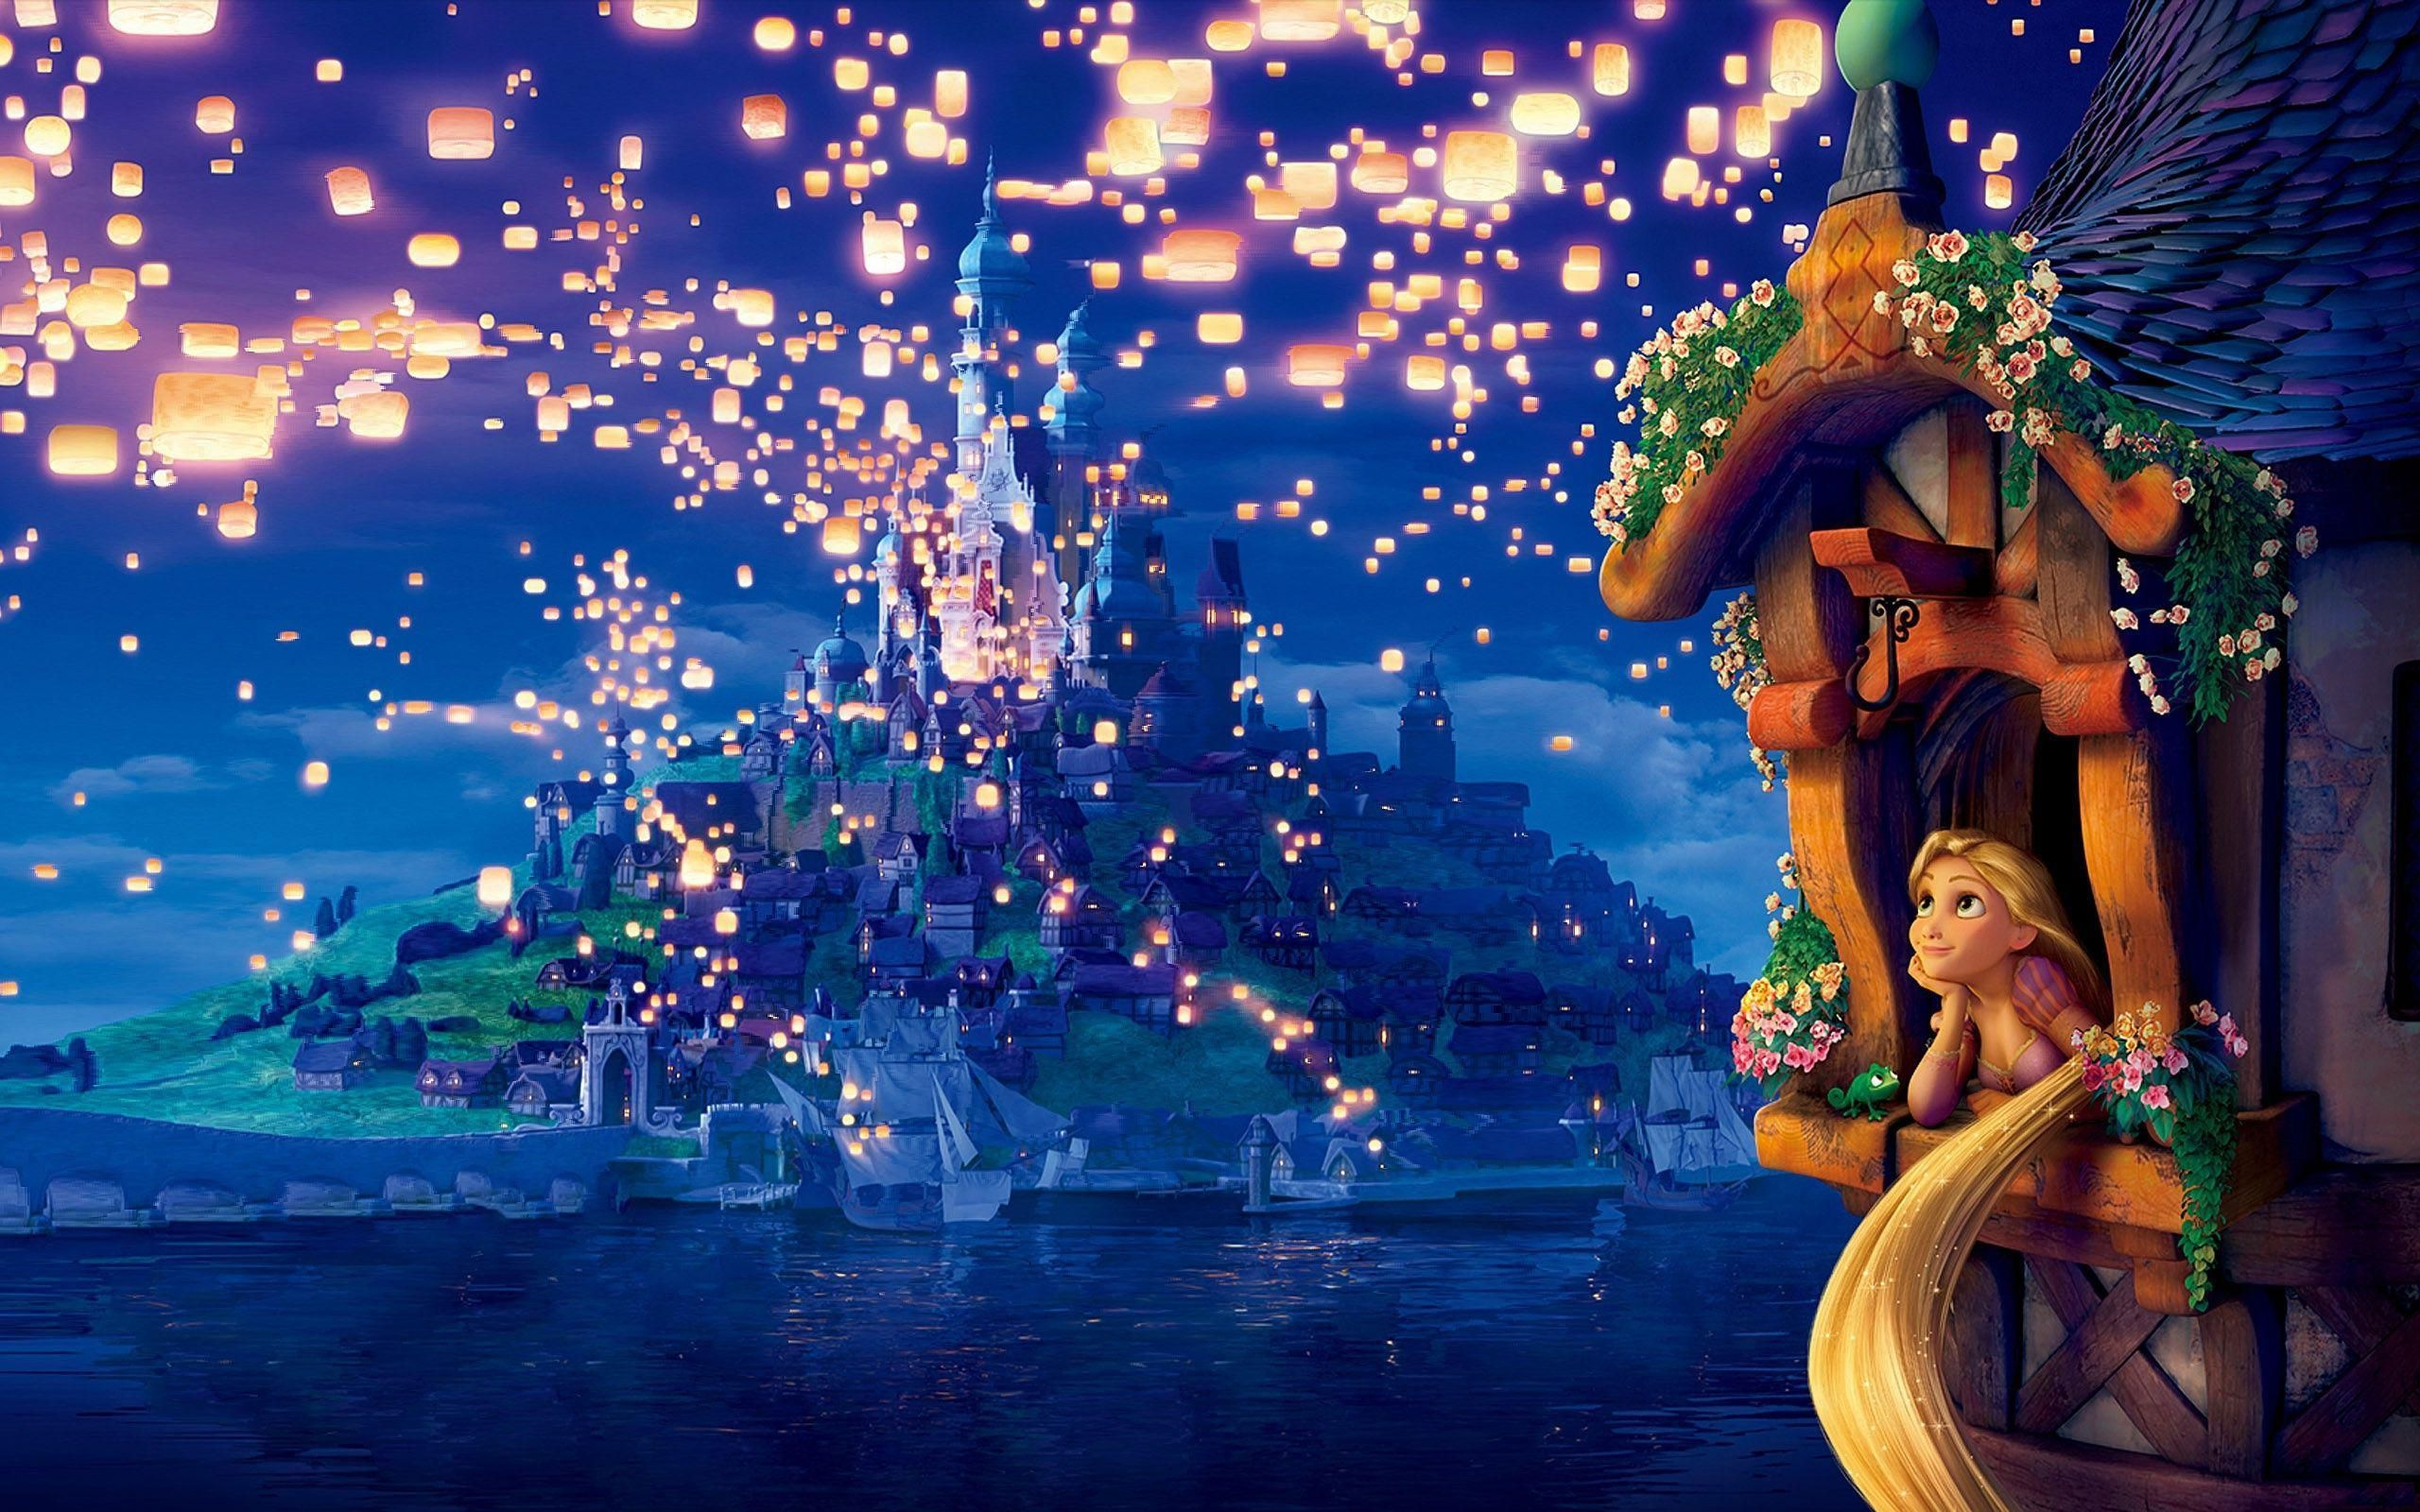 Rapunzel Enredados Fondo De Pantalla Del Ordenador Portatil Fondos De Computadora Lios De Disney